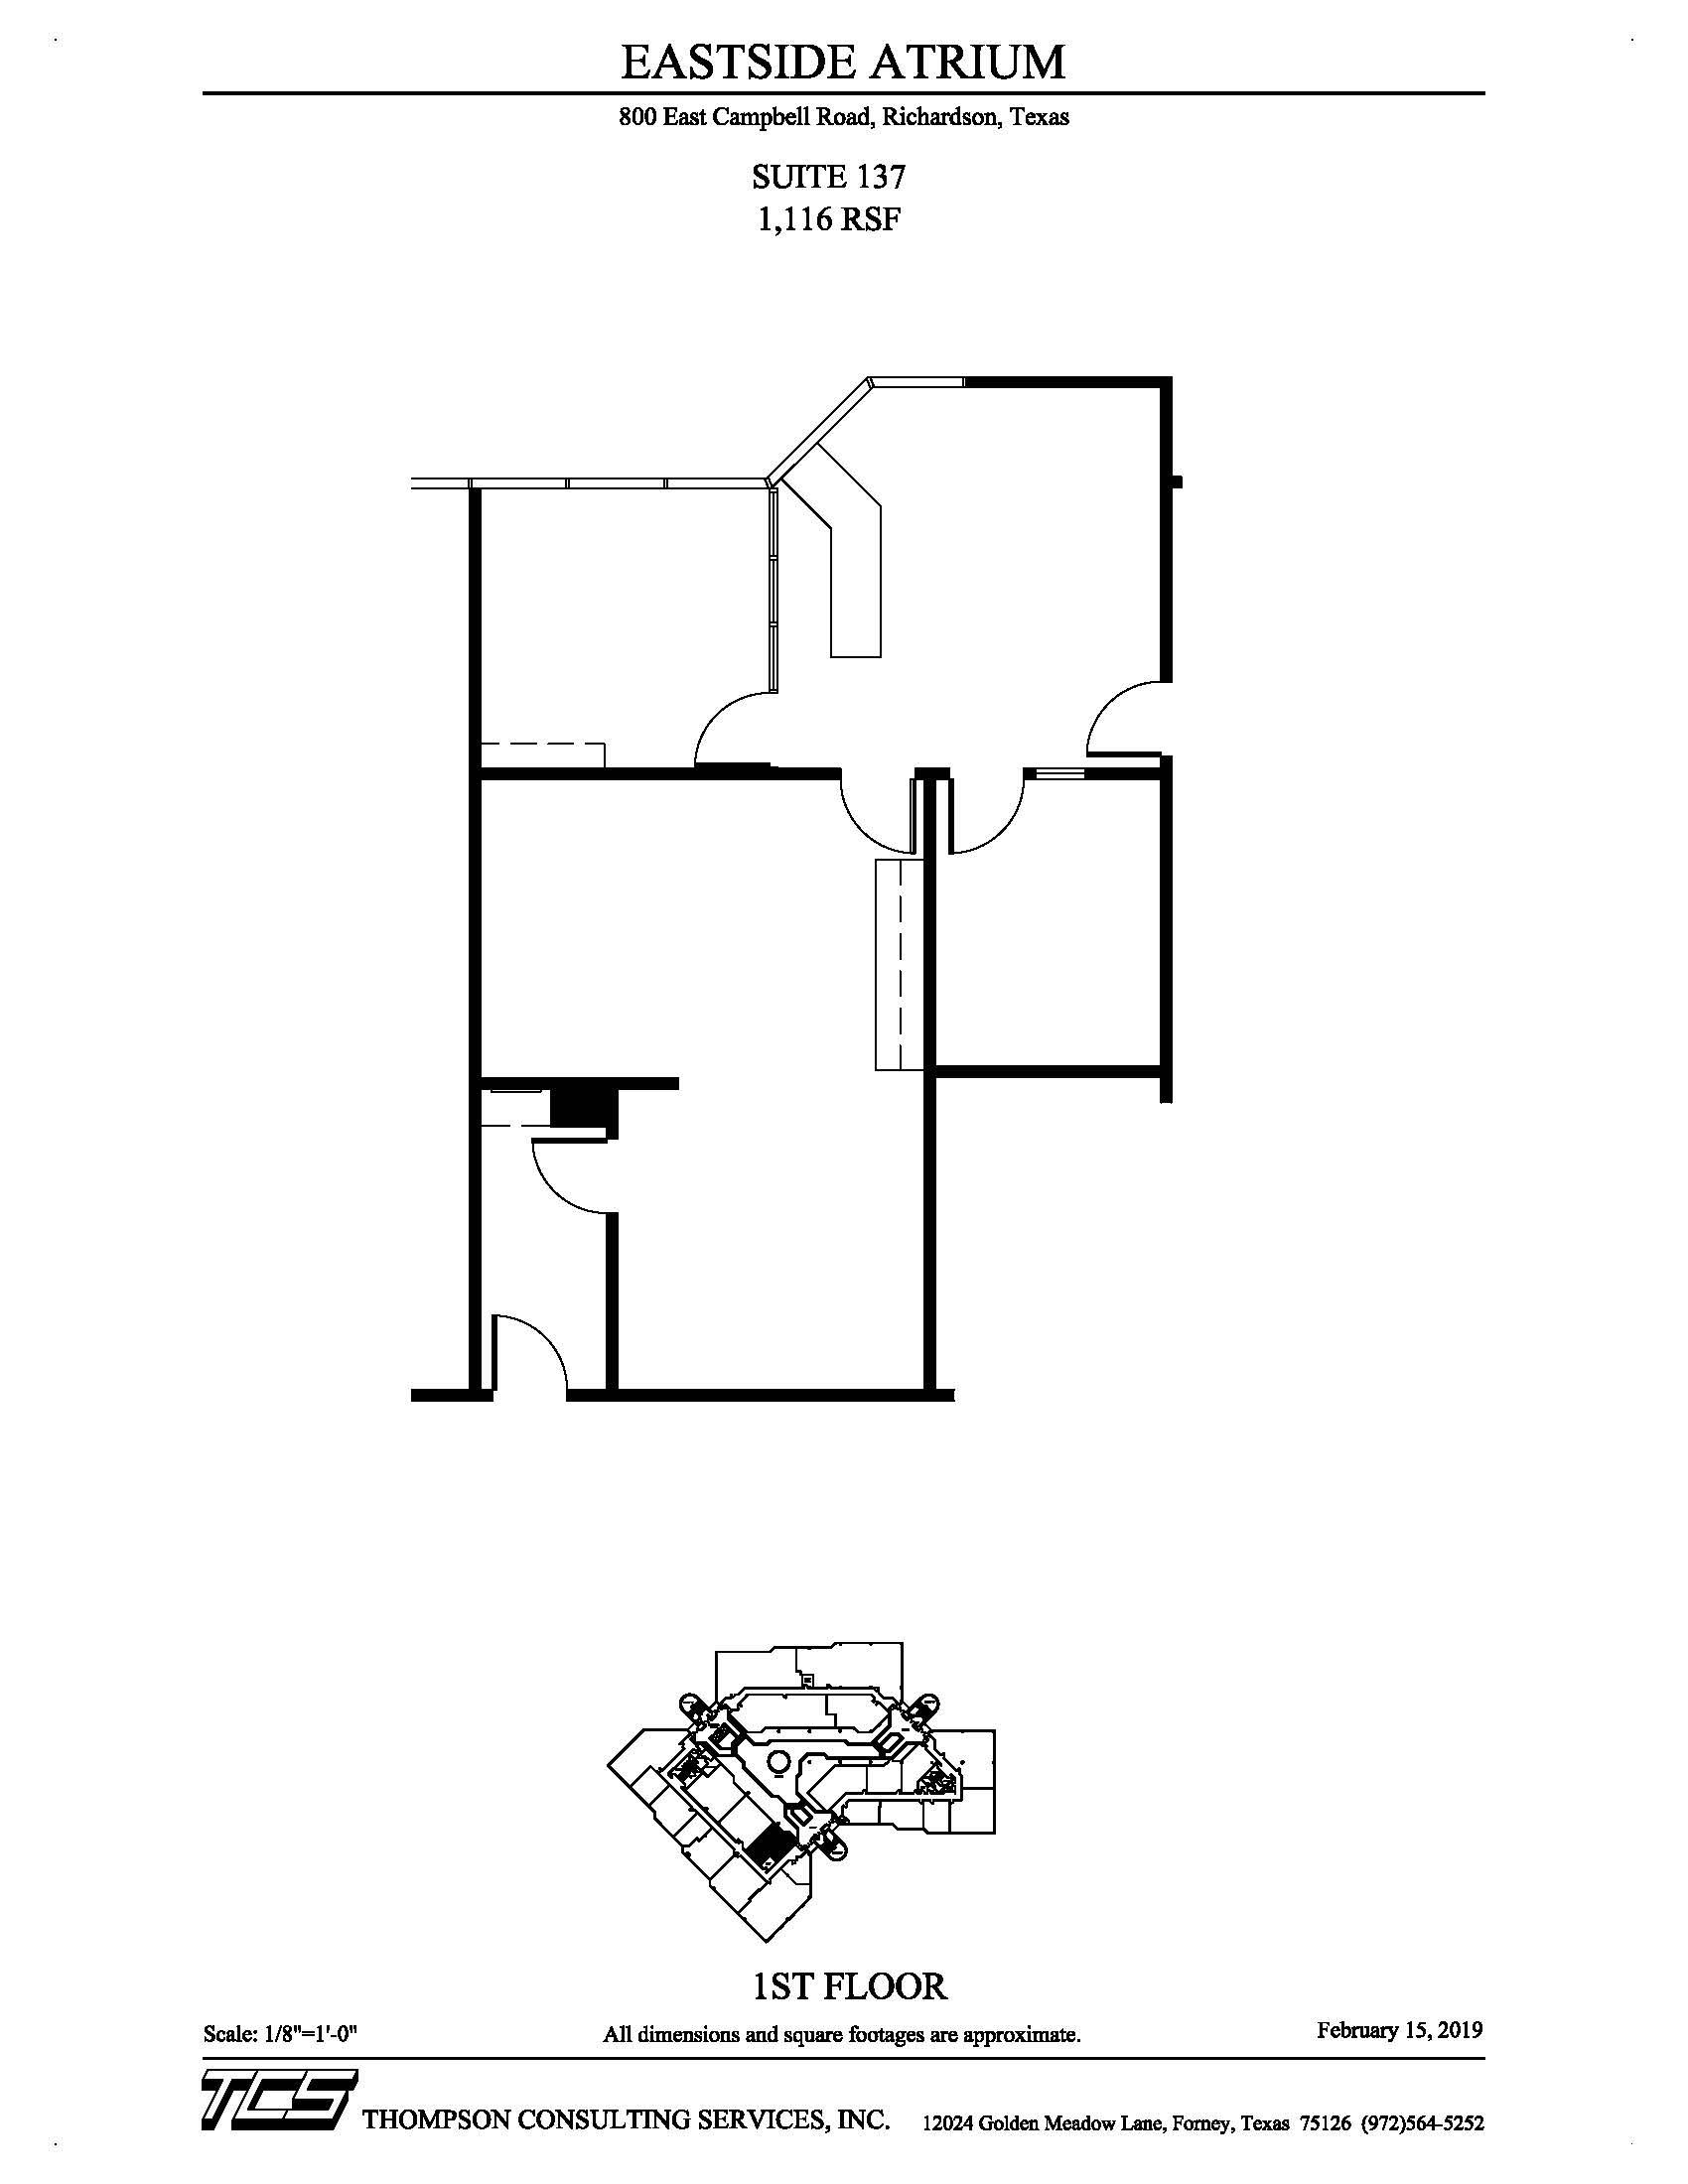 Eastside Atrium - Suite 137 - Marketing Plan.jpg